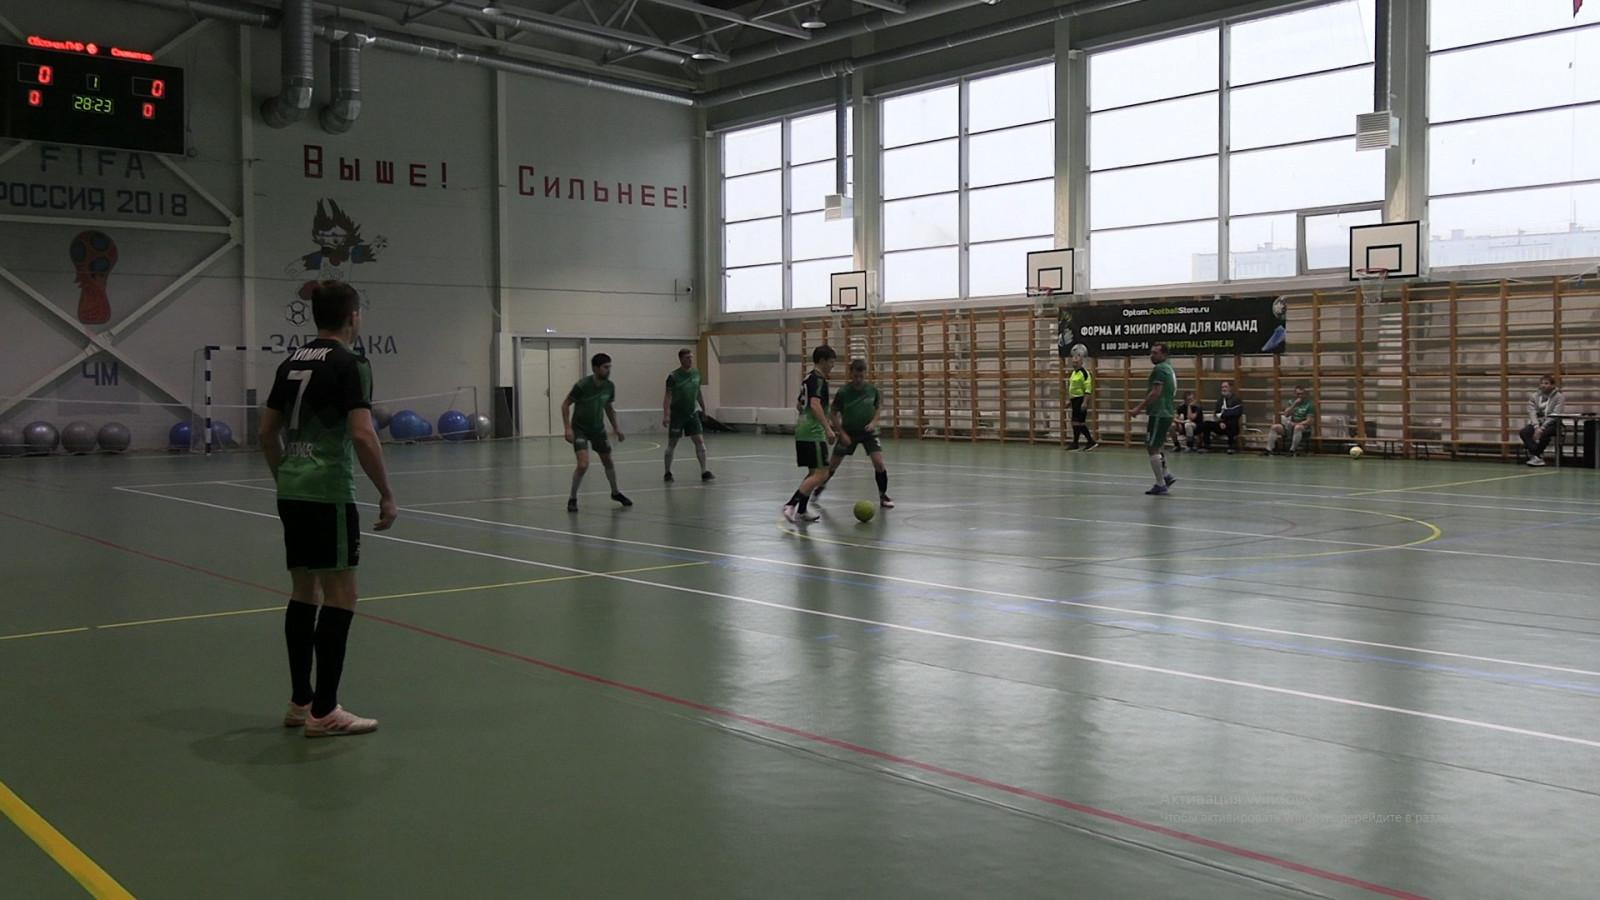 Завершился чемпионат по мини-футболу